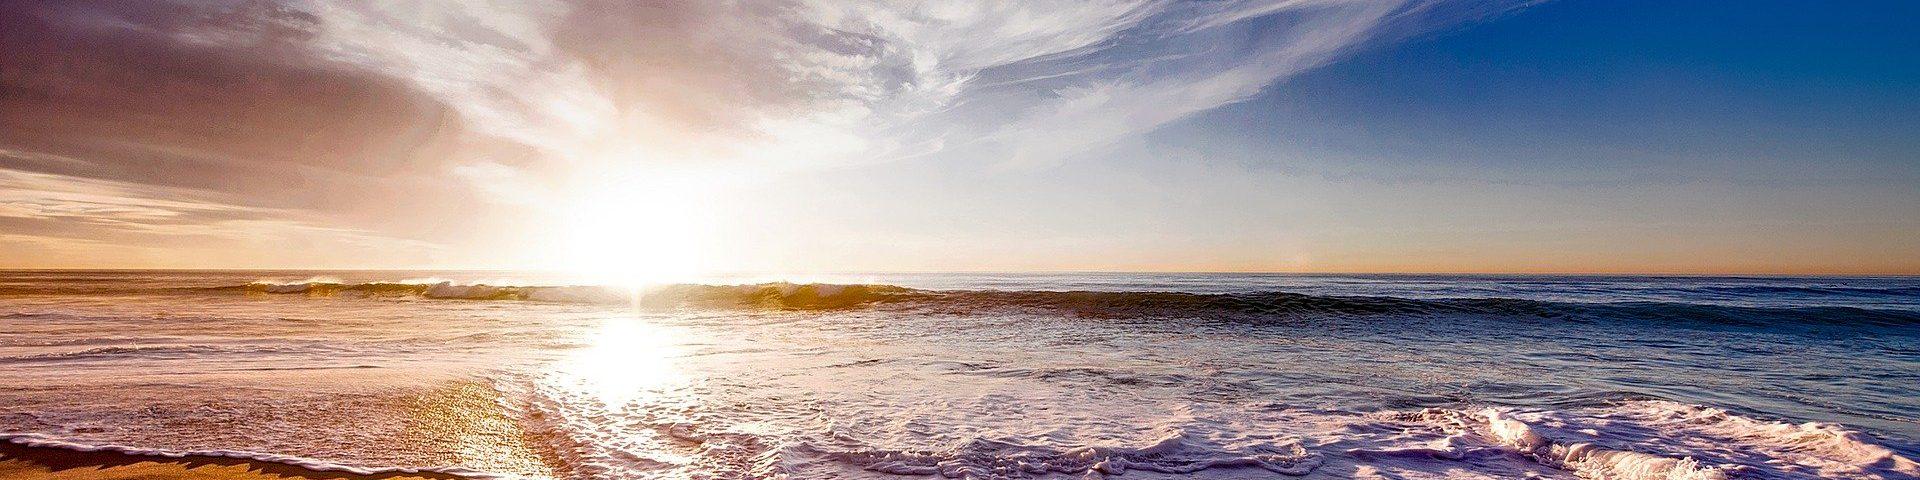 Ocean Renewable Energy and Marine Governance_img